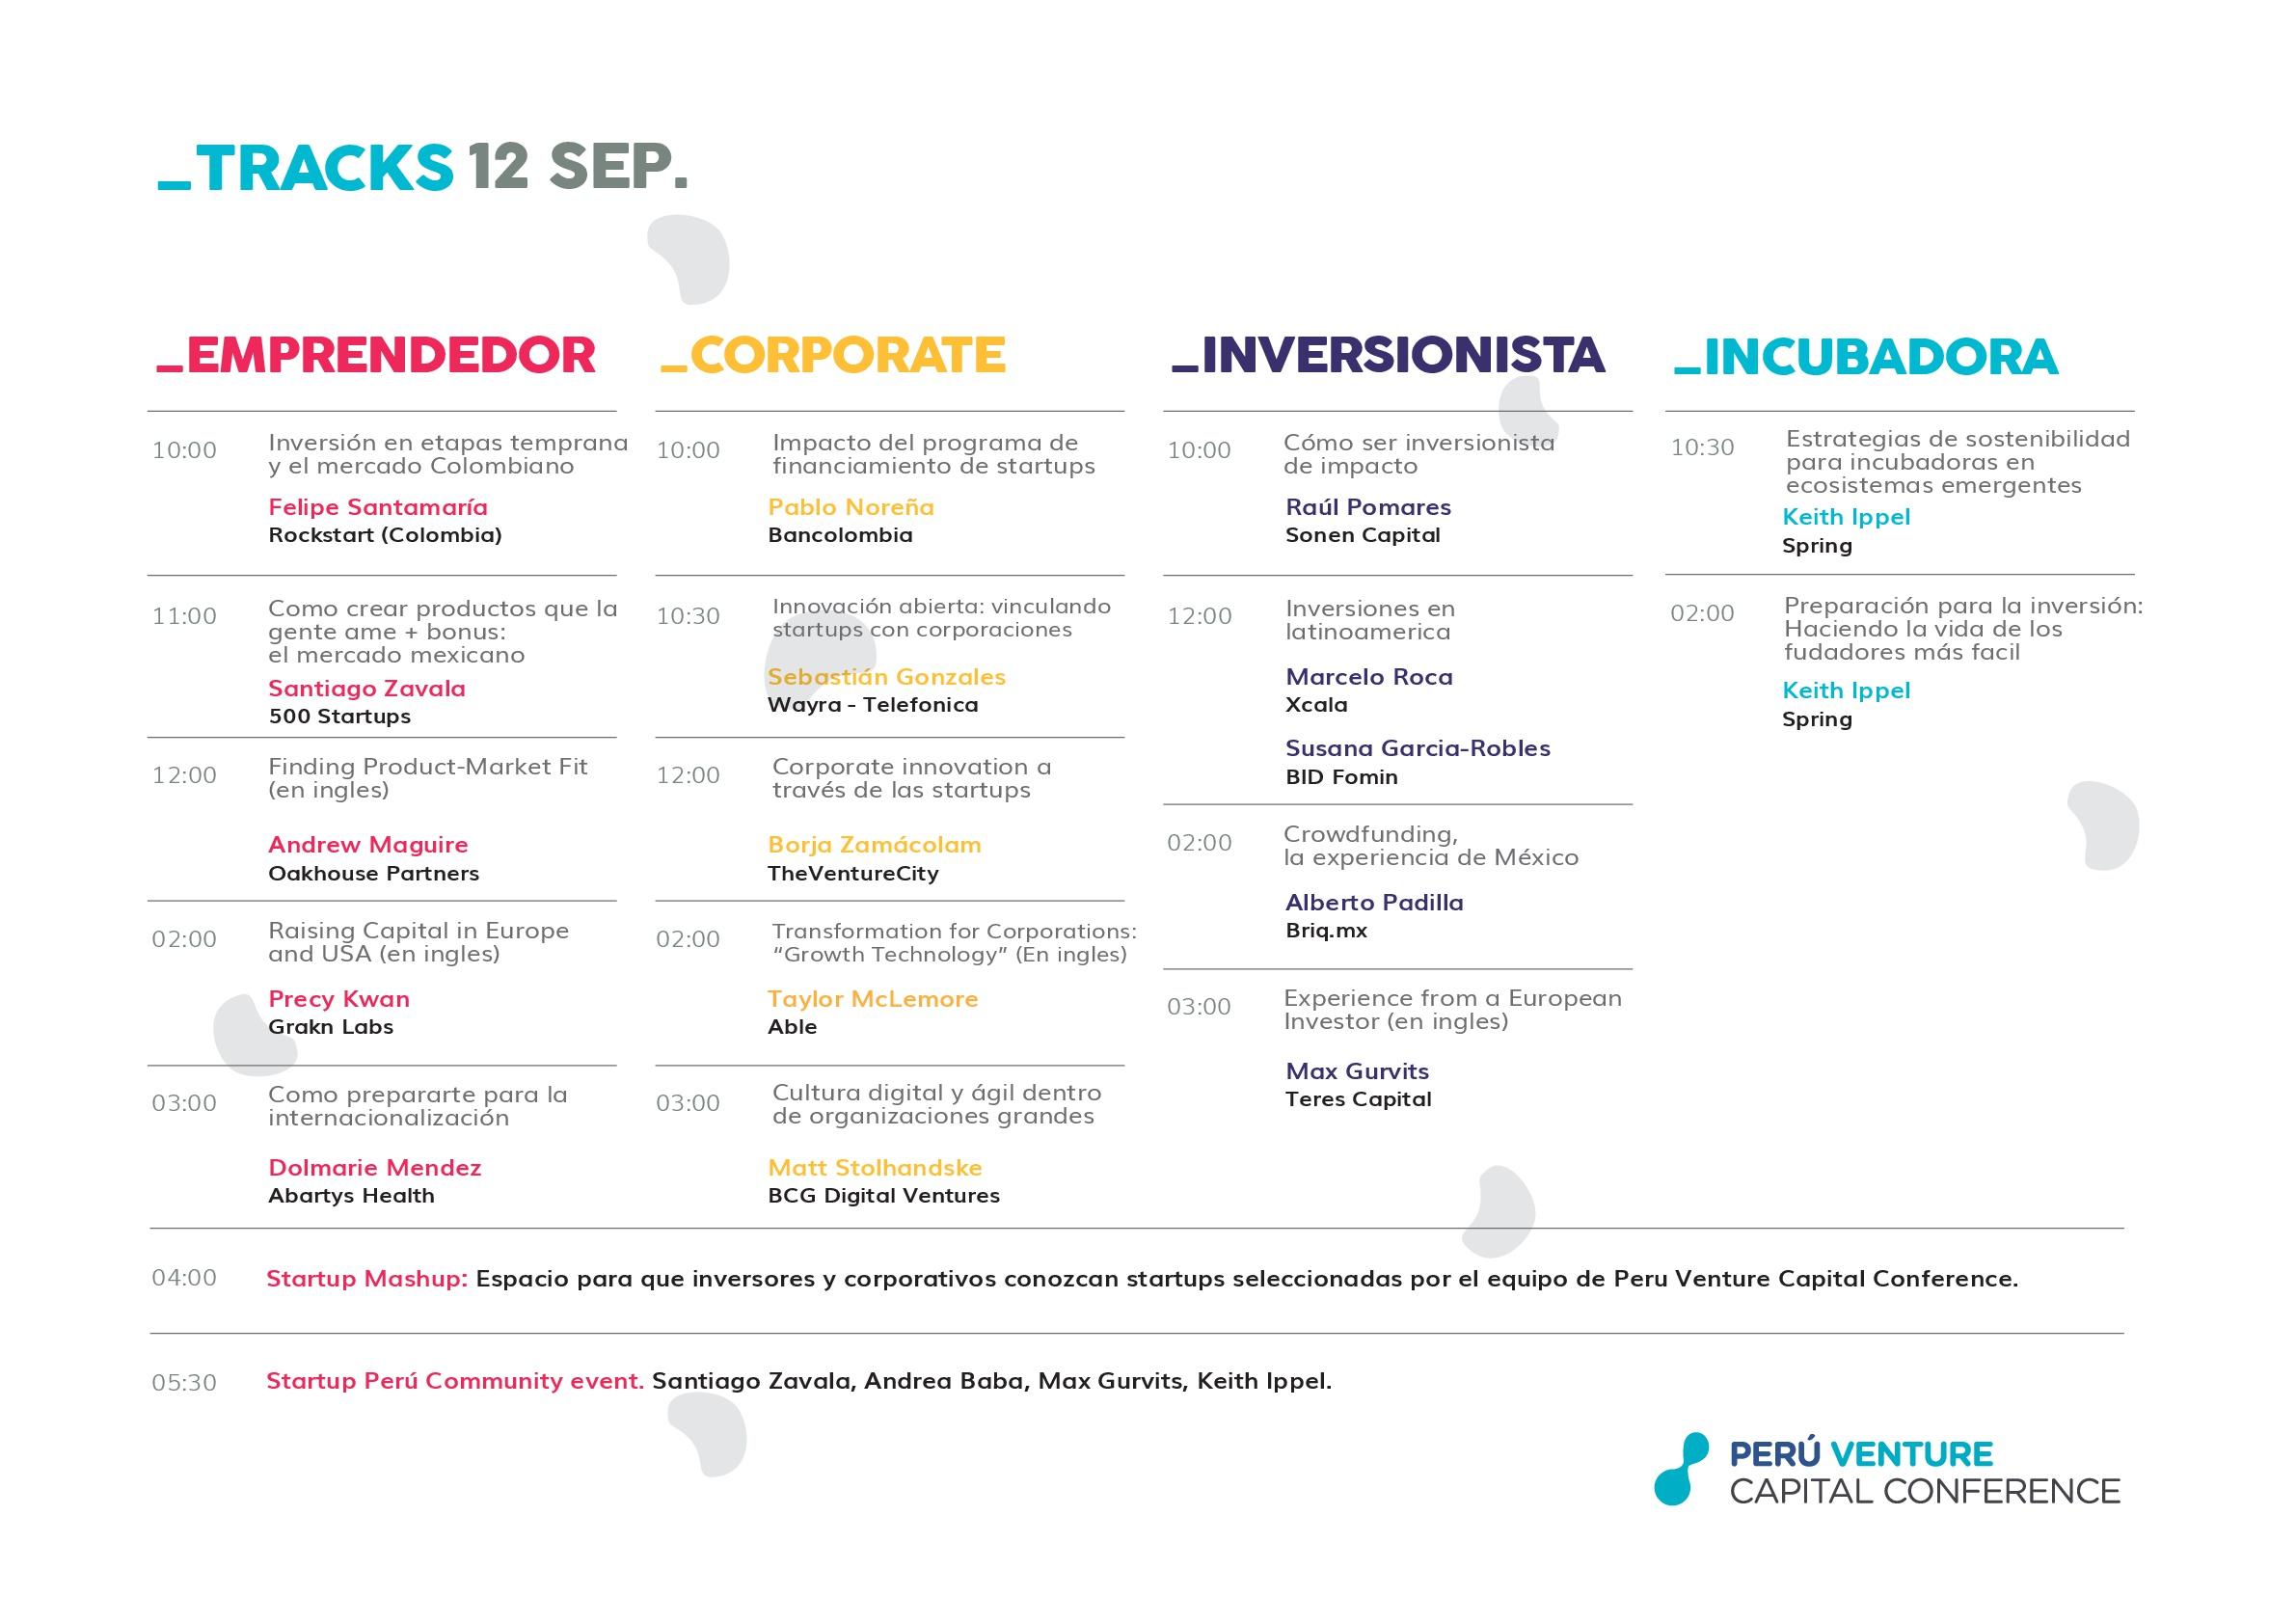 Peru-Venture-Capital-Conference---Programa-005.jpg